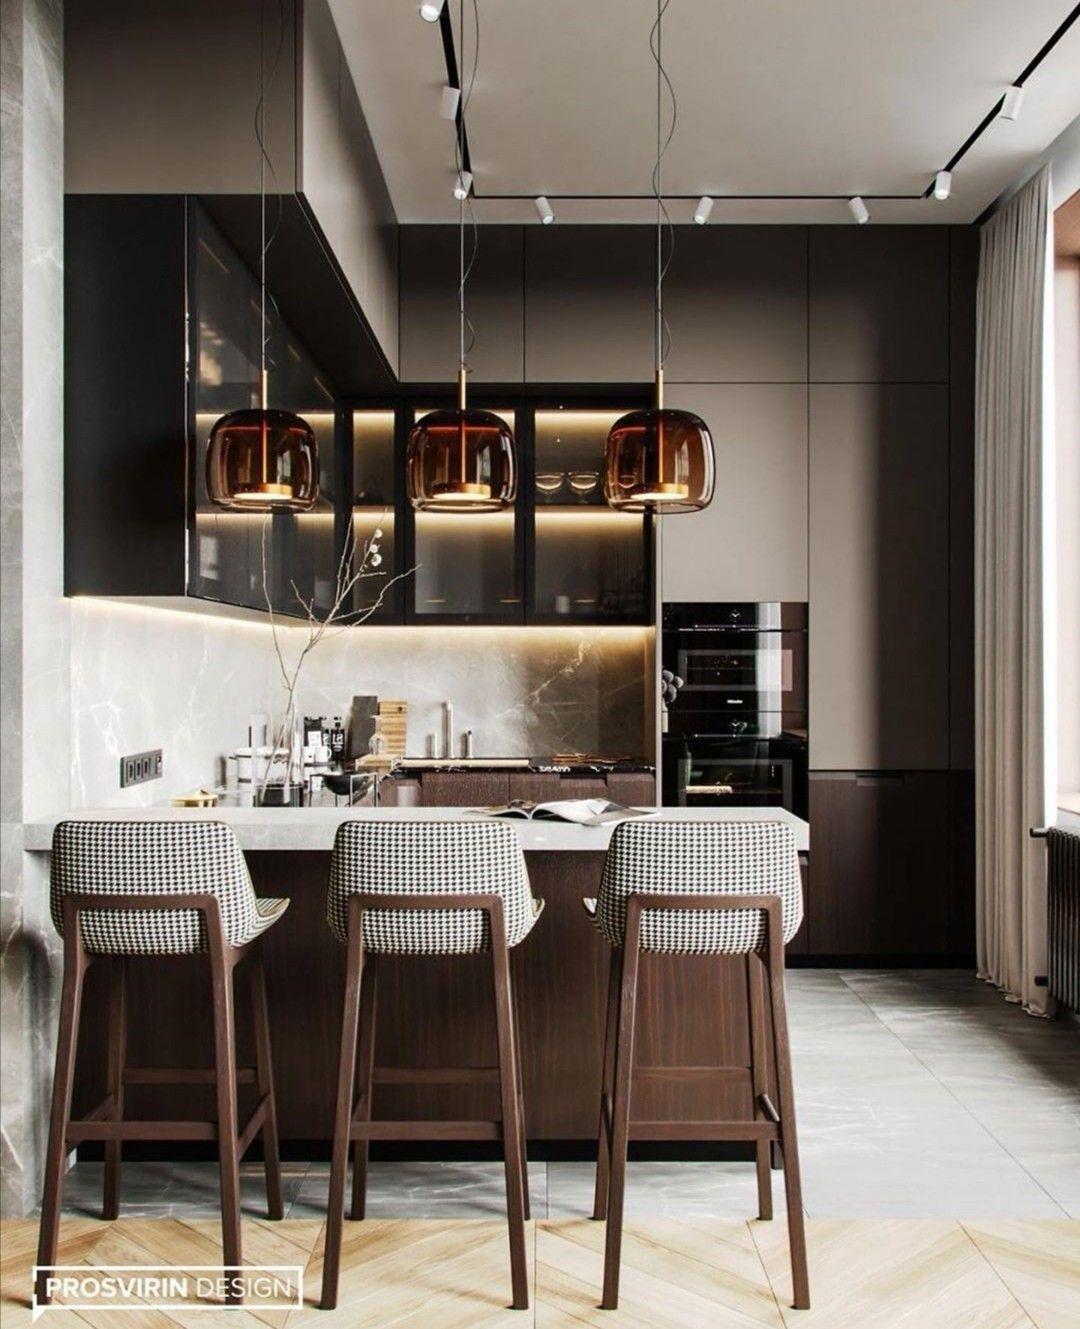 Best Idee De Design Pour Cuisine